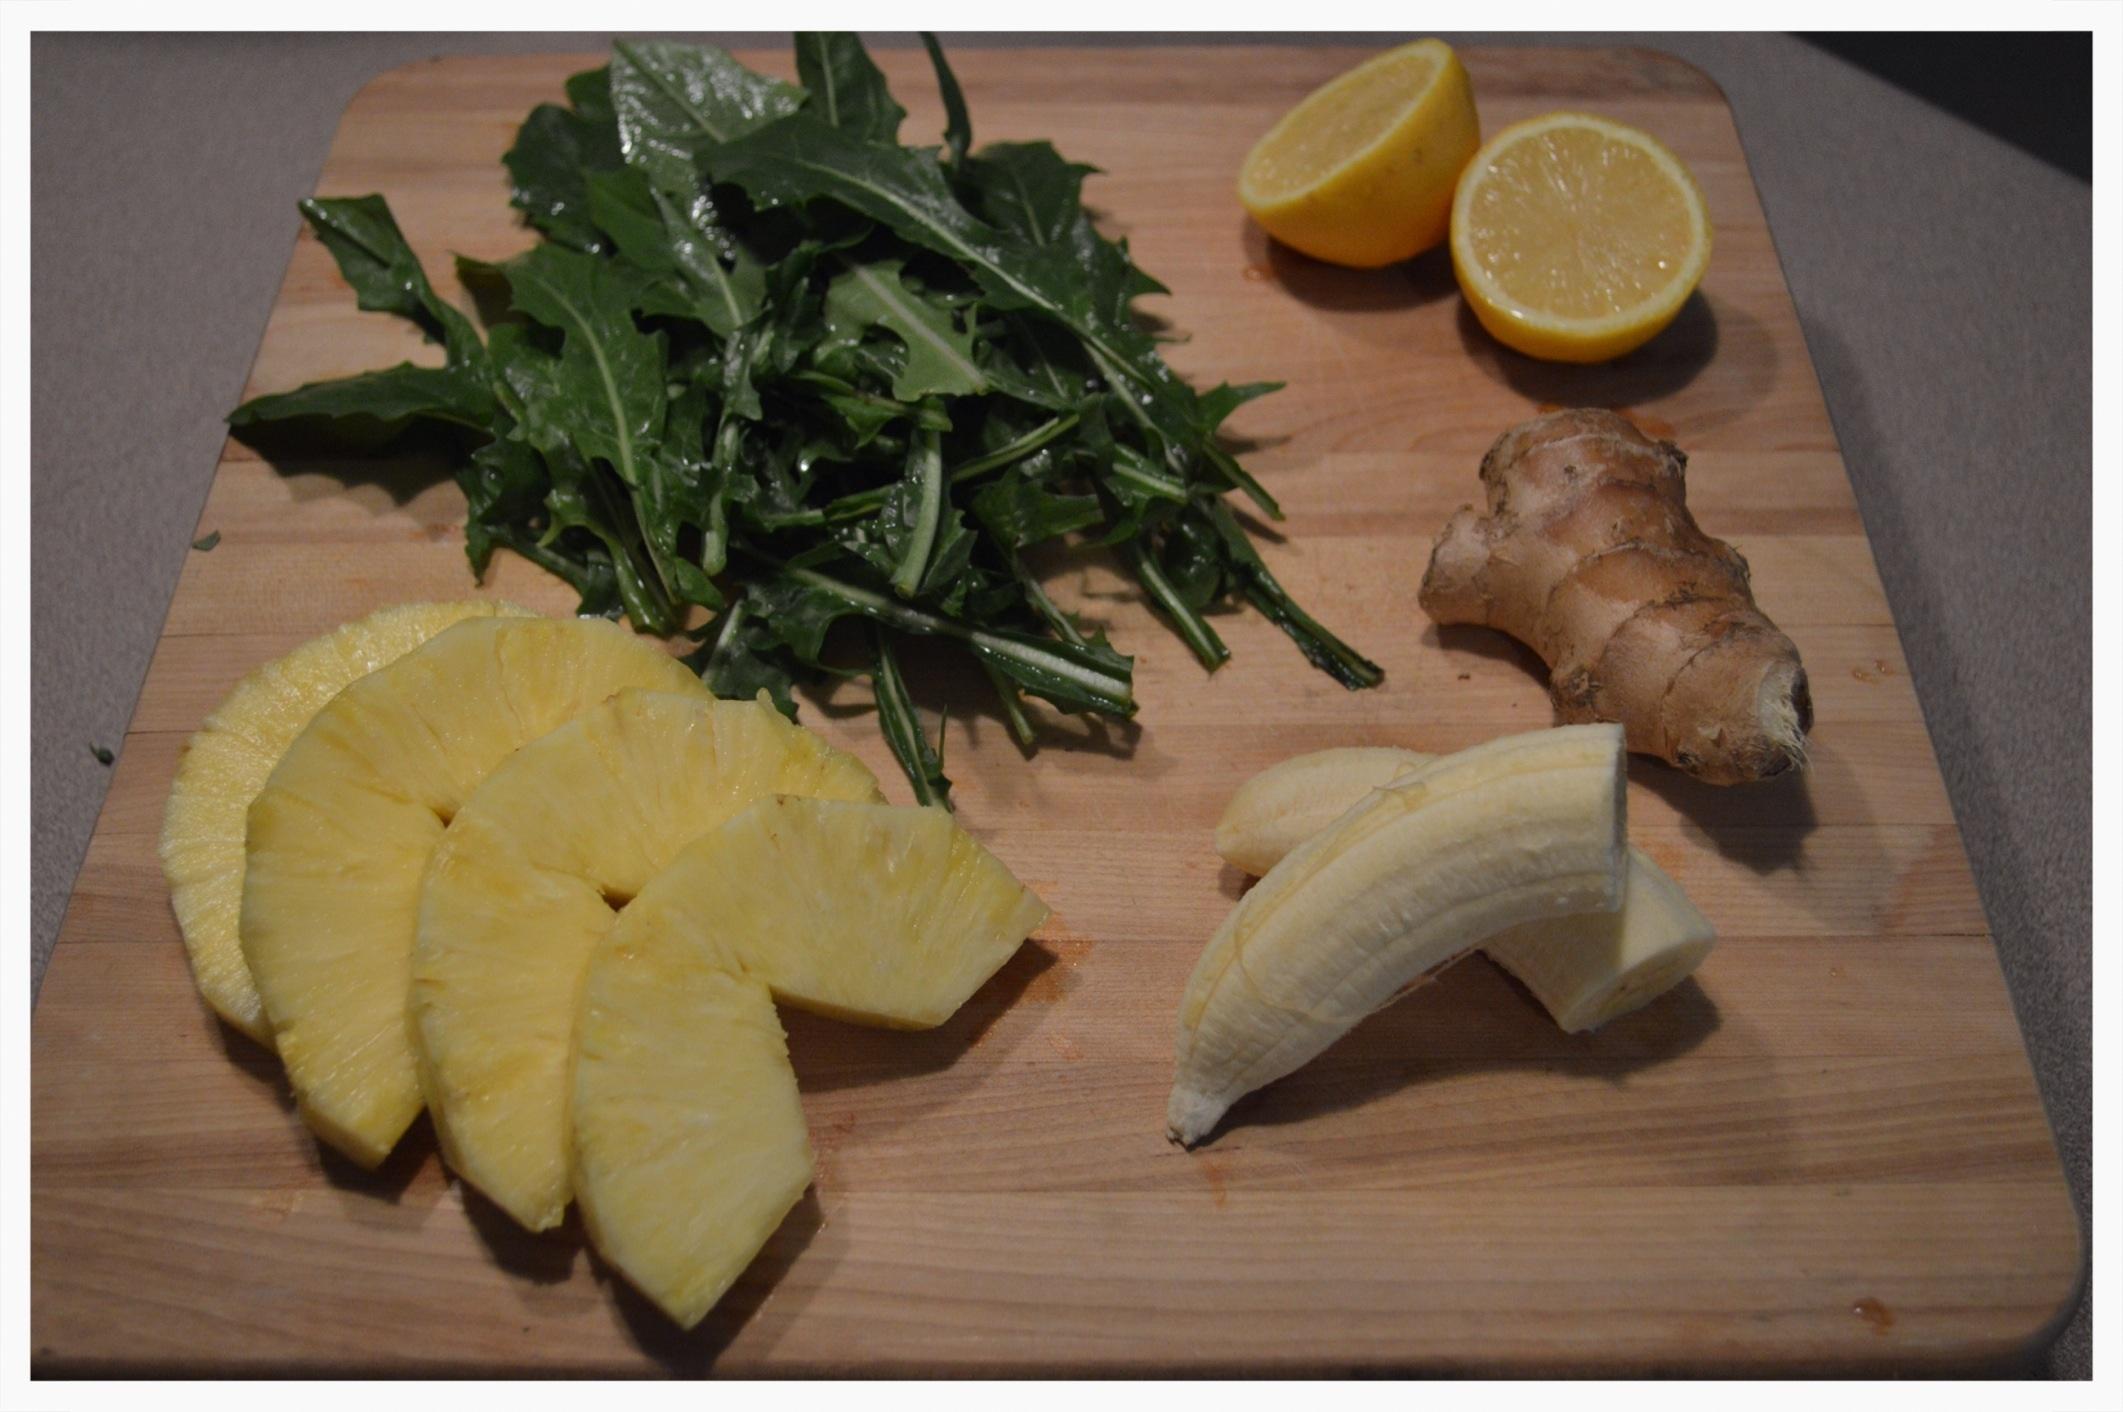 Dandelion Greens Smoothie Recipe